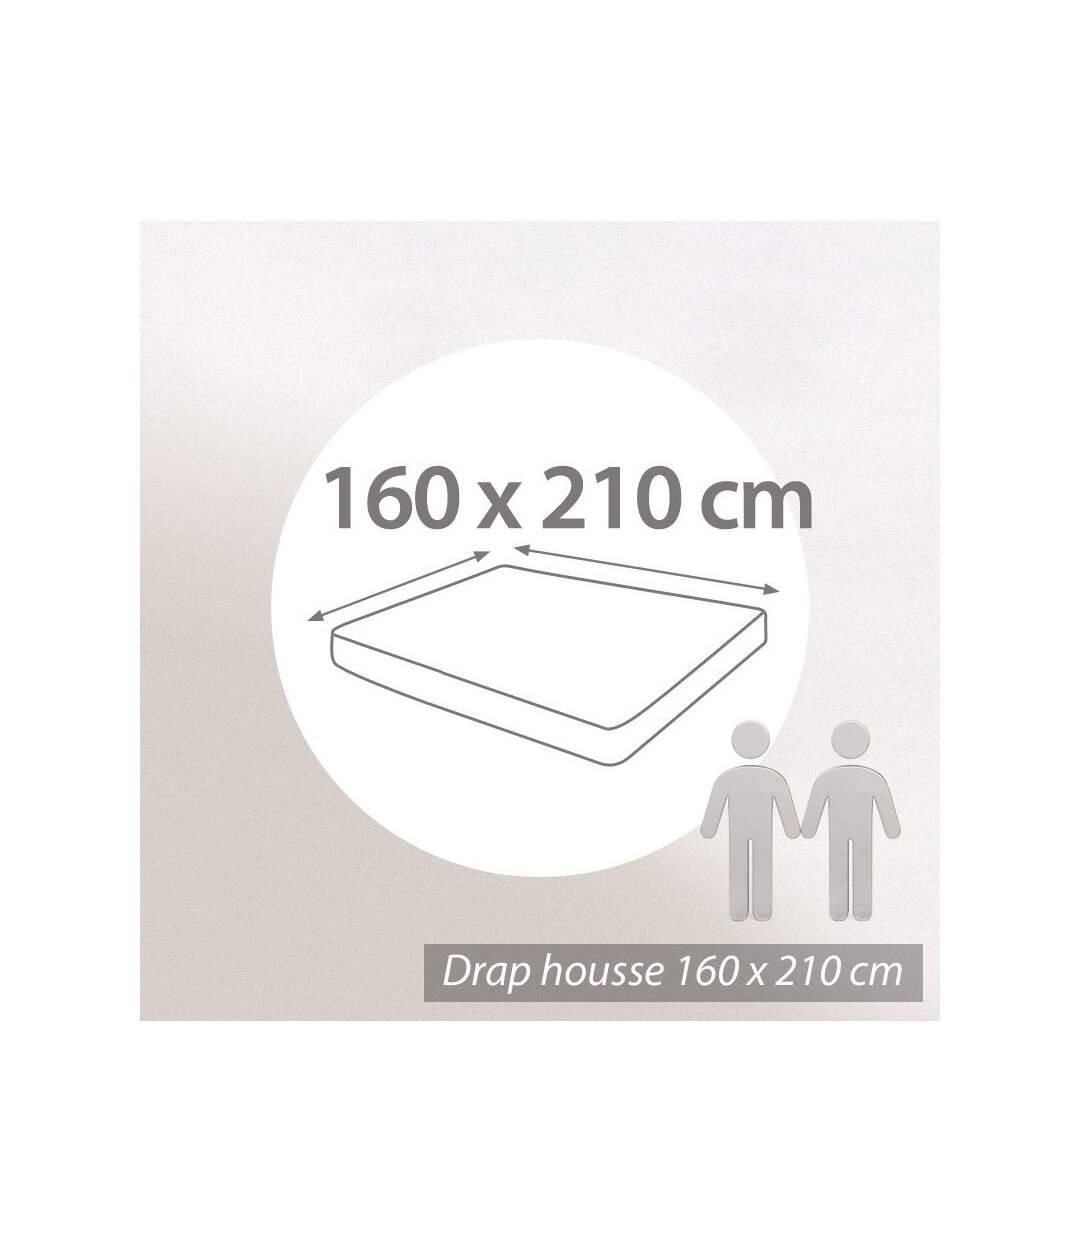 Protège matelas absorbant Antonin blanc 160x210 Grand Bonnet 30cm